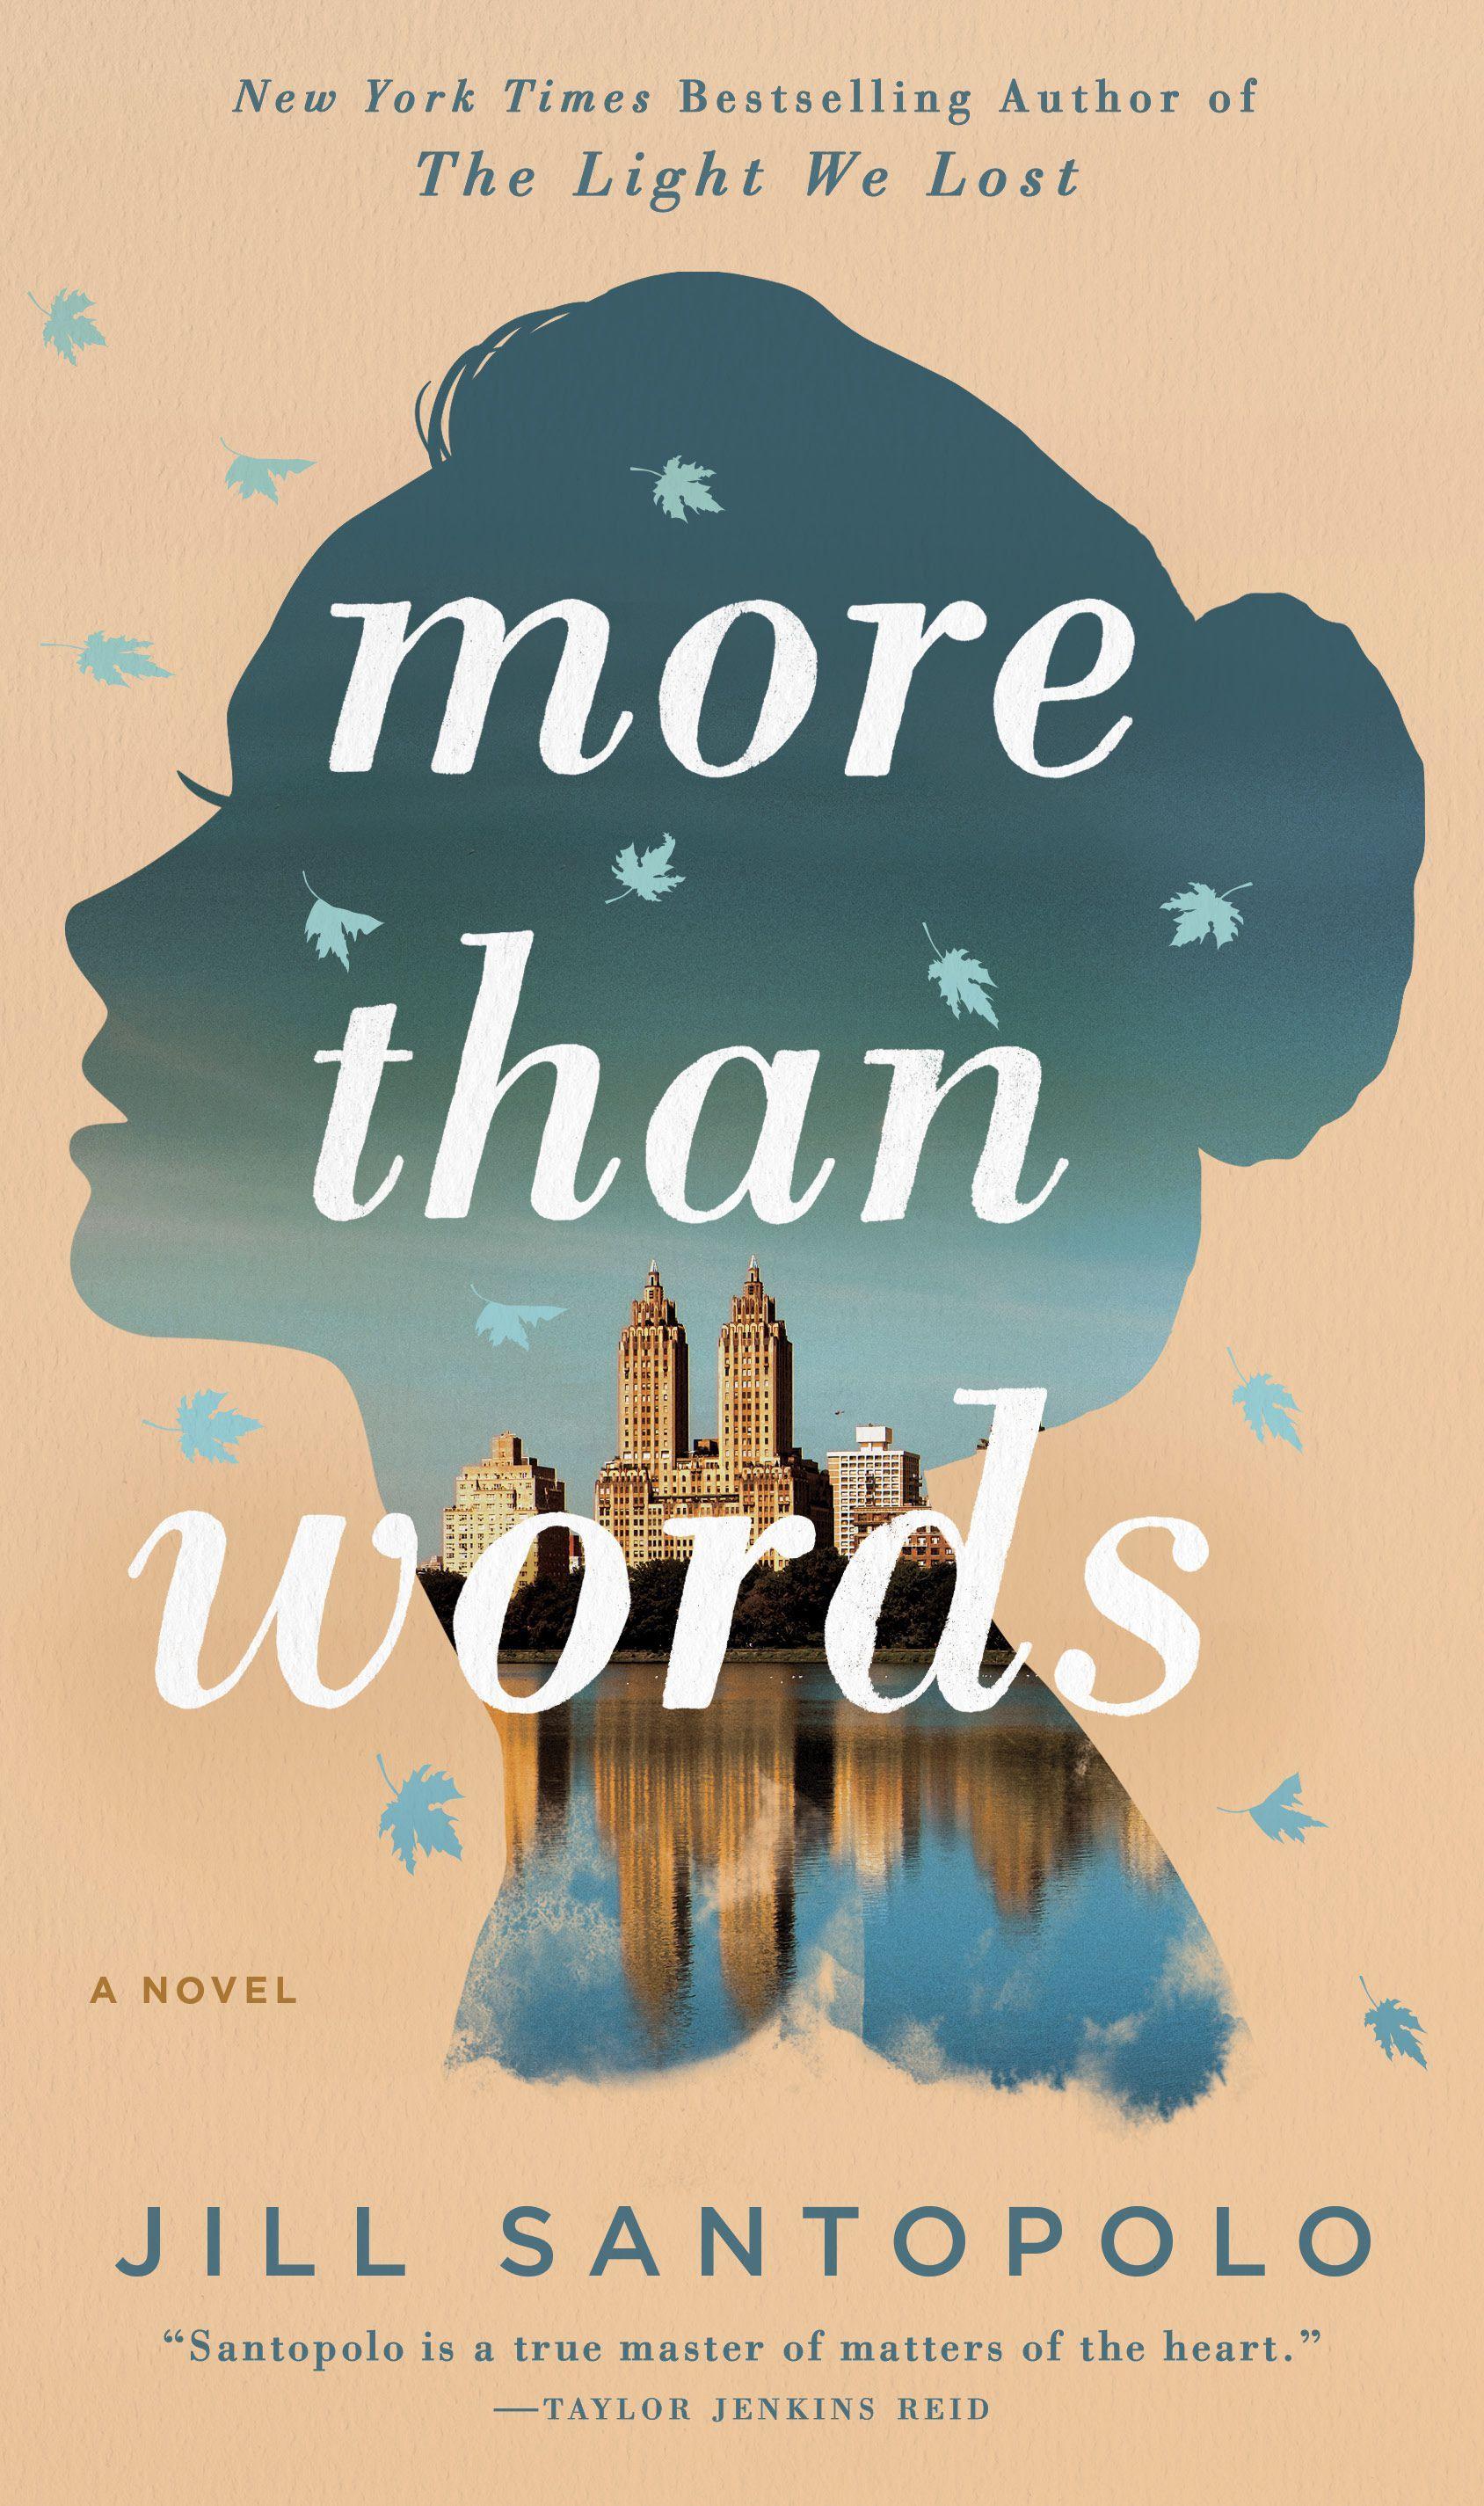 'More Than Words' by Jill Santopolo